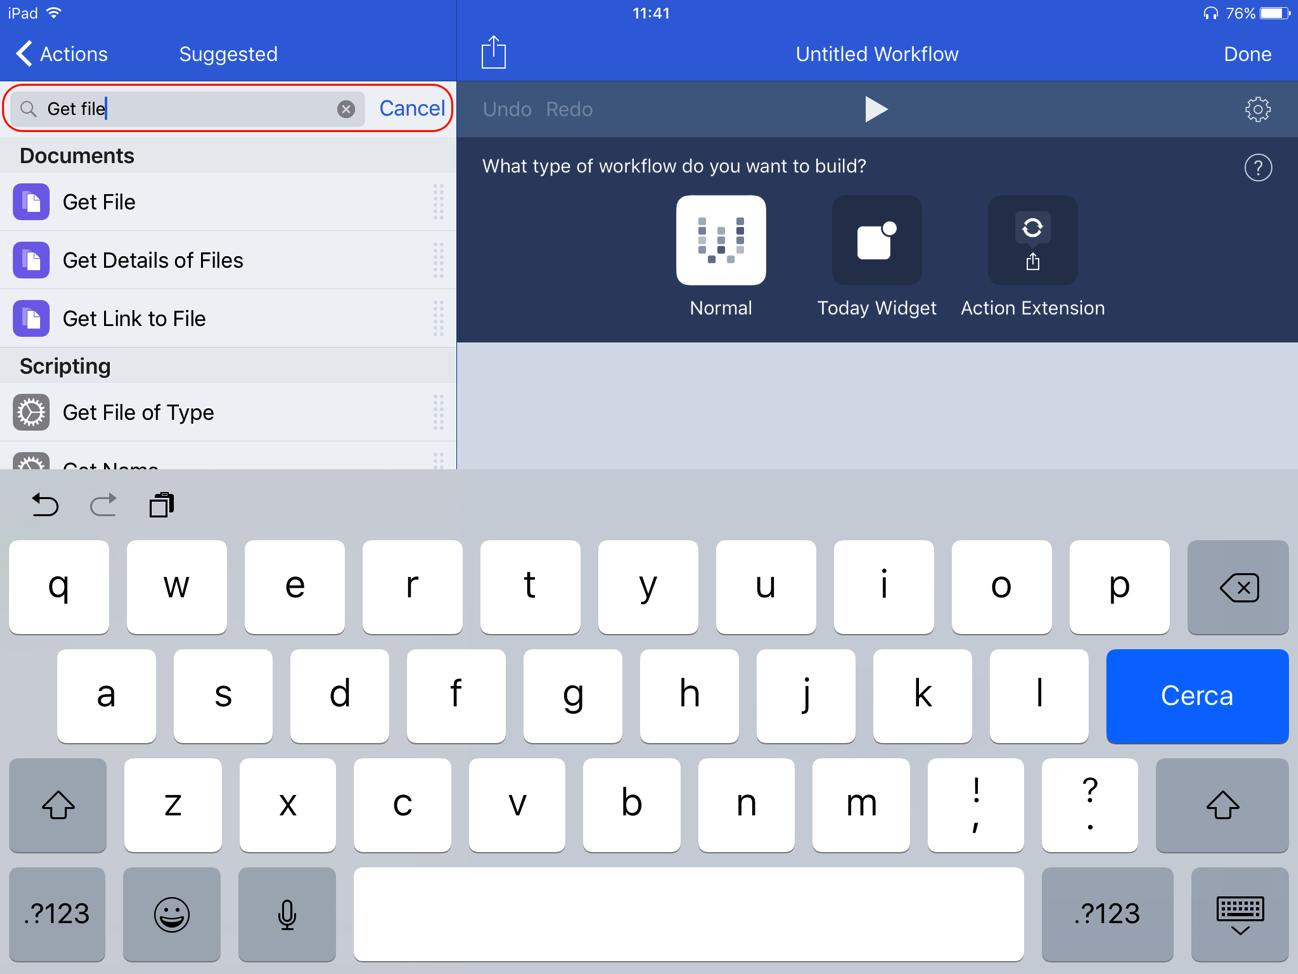 Creare archivio zip iPad